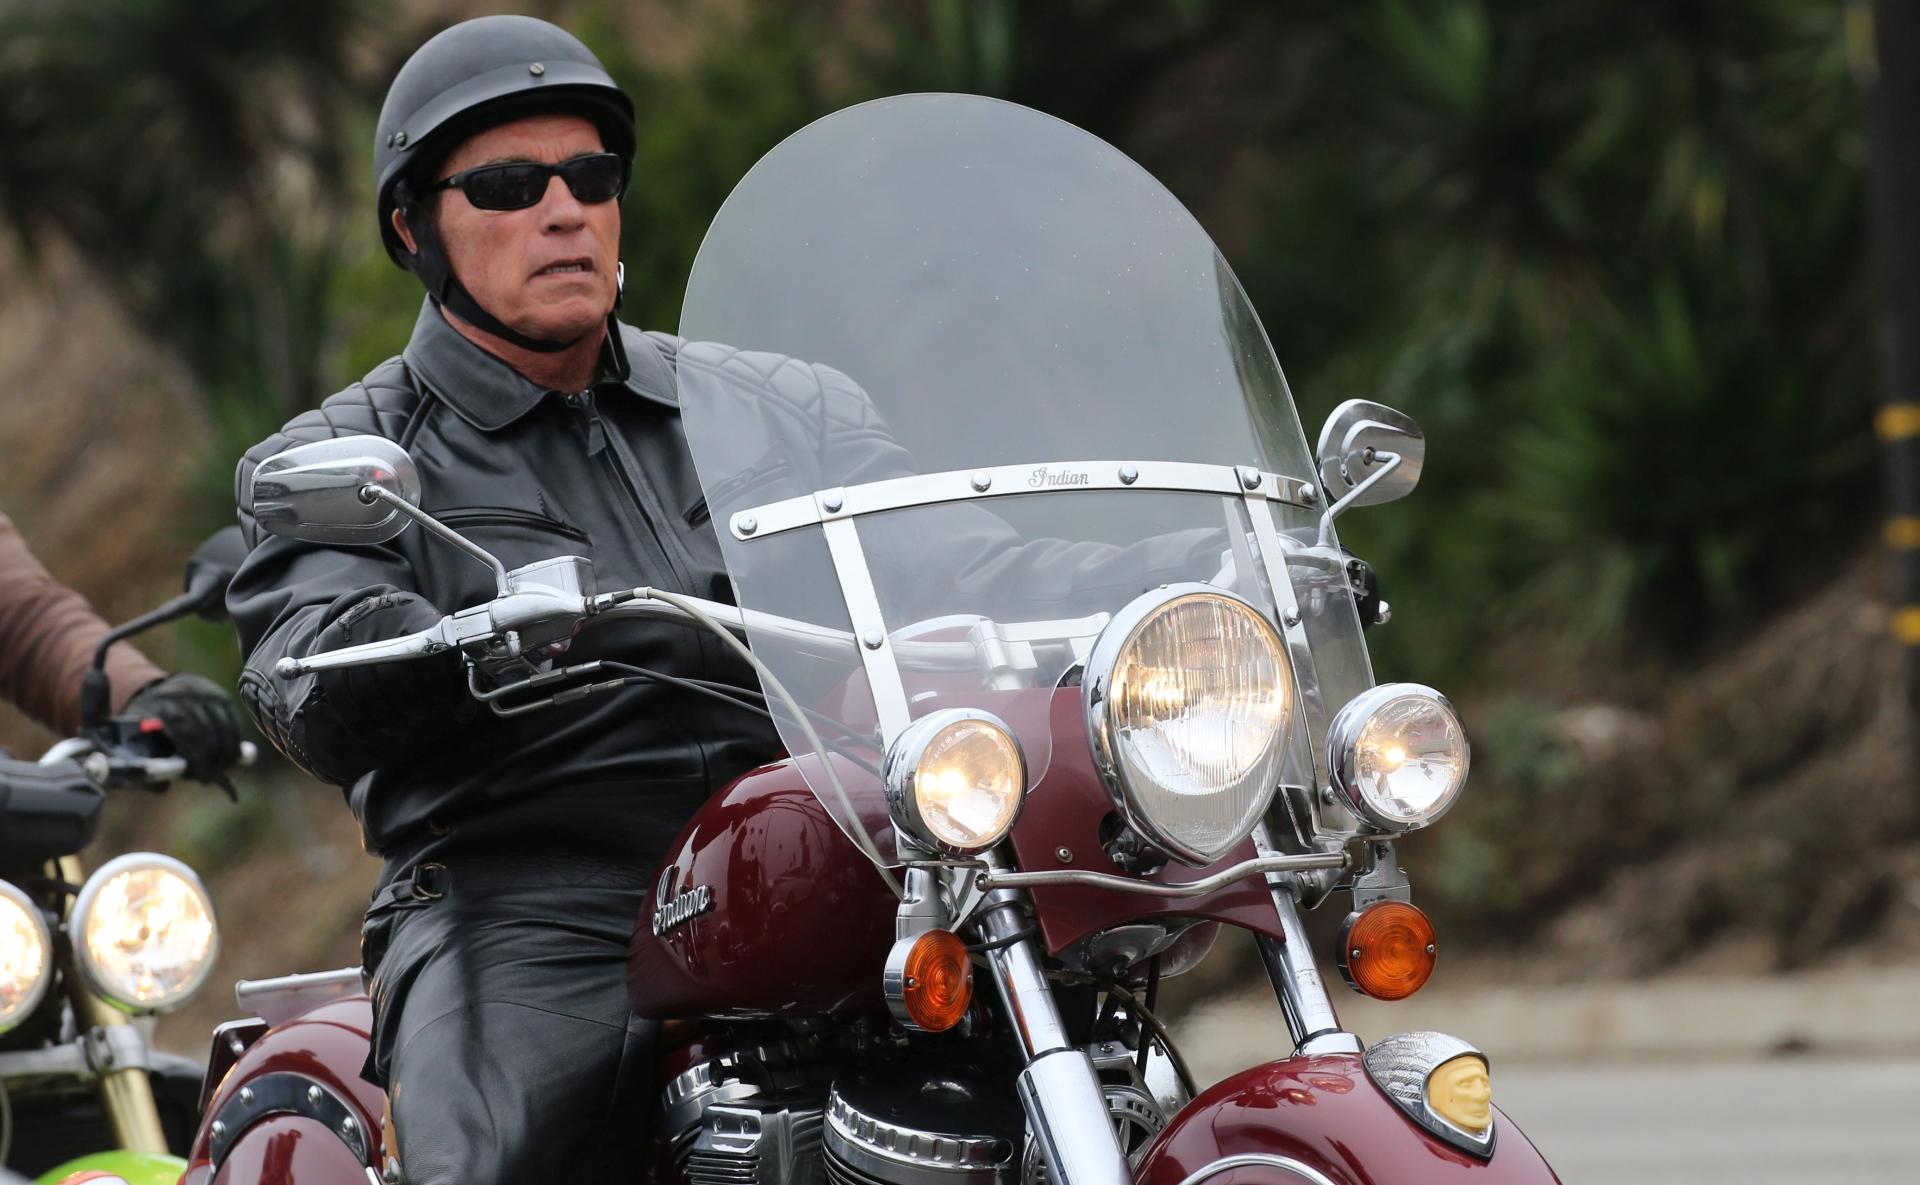 X17_Arnold_Schwarzenegger_Motorcycle_082717_12.JPG